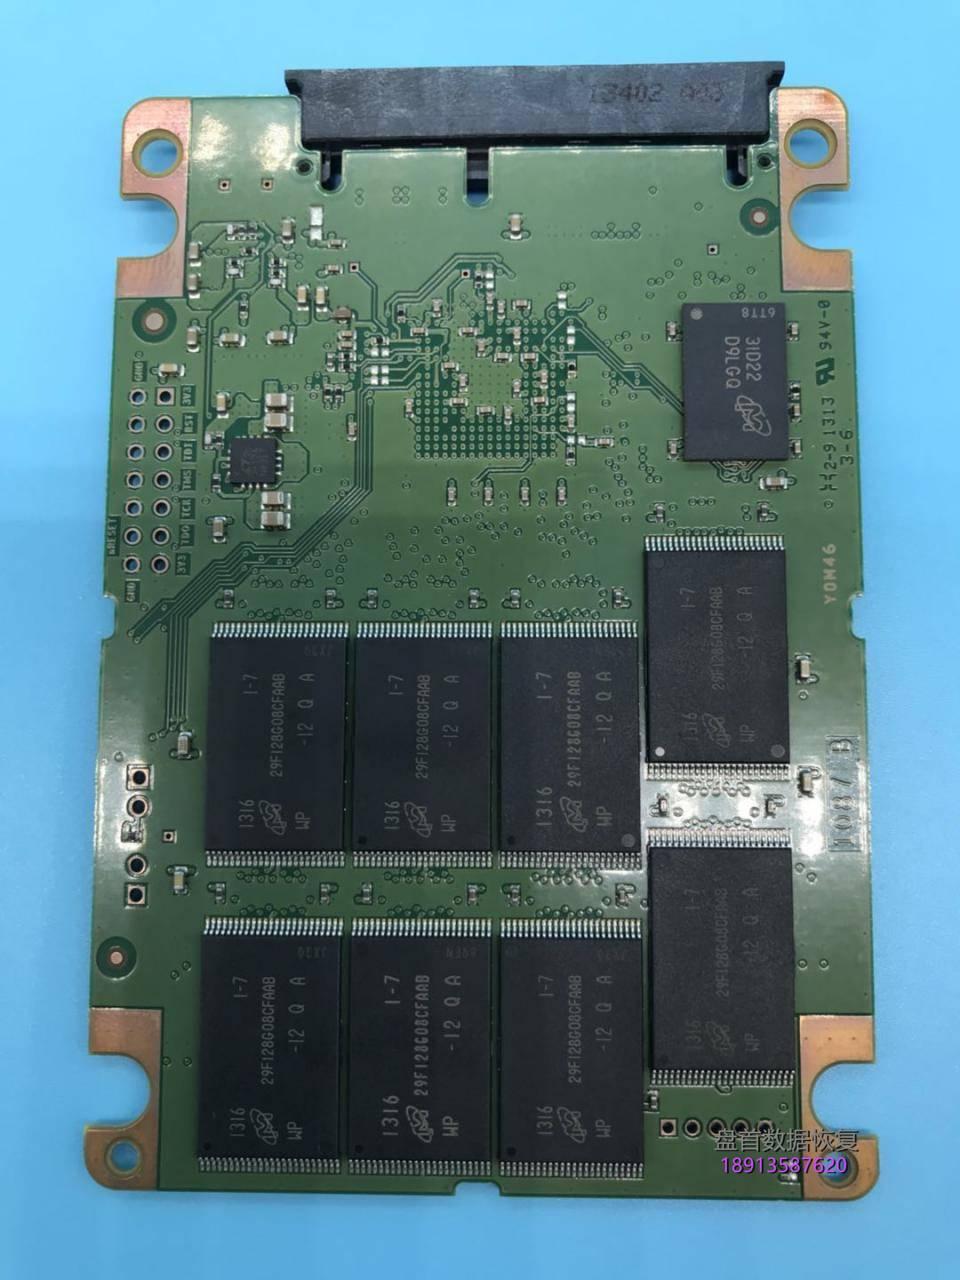 realssd美光c400主控marvell88ss9174-ssd固态硬盘掉盘后无法访问数据恢 RealSSD美光C400主控Marvell88SS9174 SSD固态硬盘掉盘后无法访问数据恢复成功